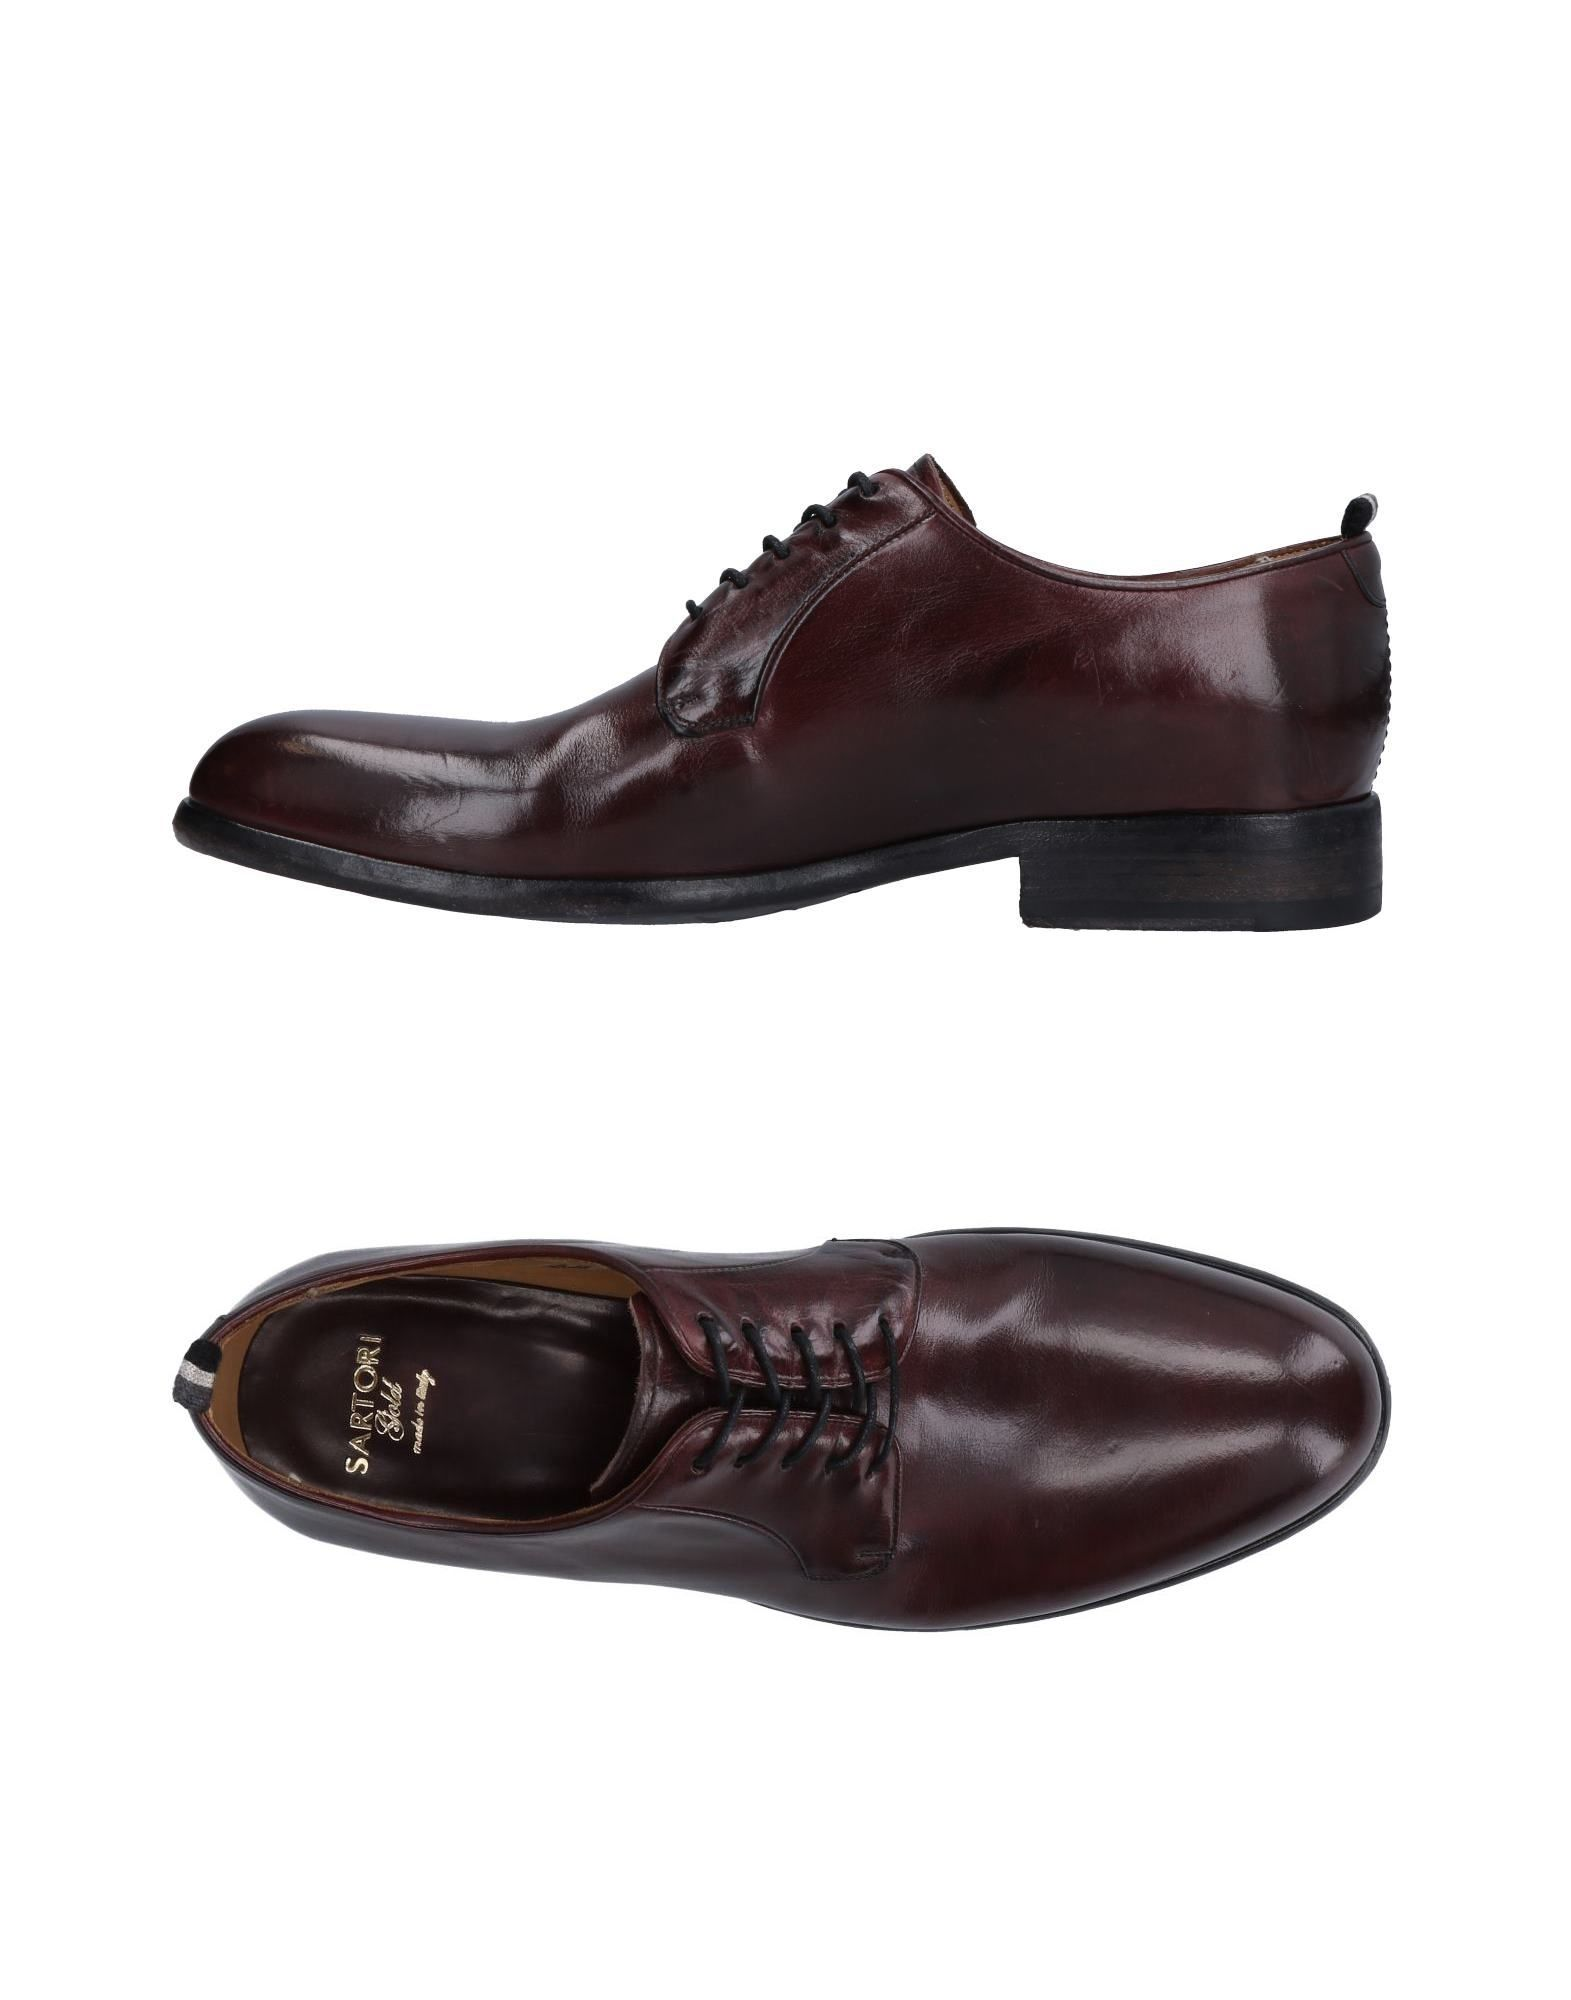 Sartori Gold Schnürschuhe Herren  11508081GD Gute Qualität beliebte Schuhe